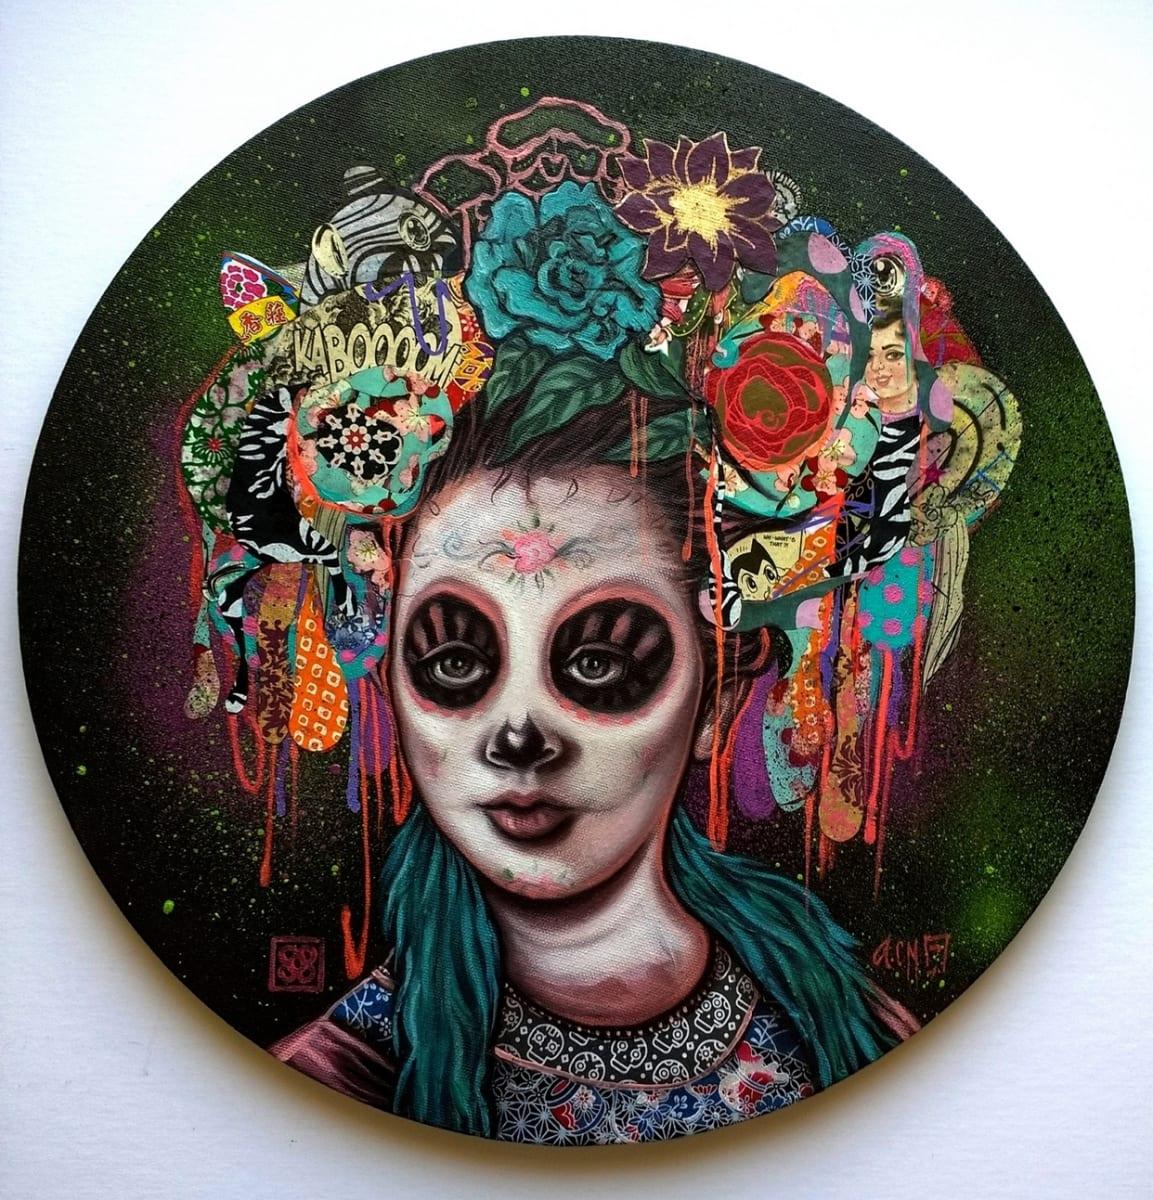 Maja by Angelica Contreras